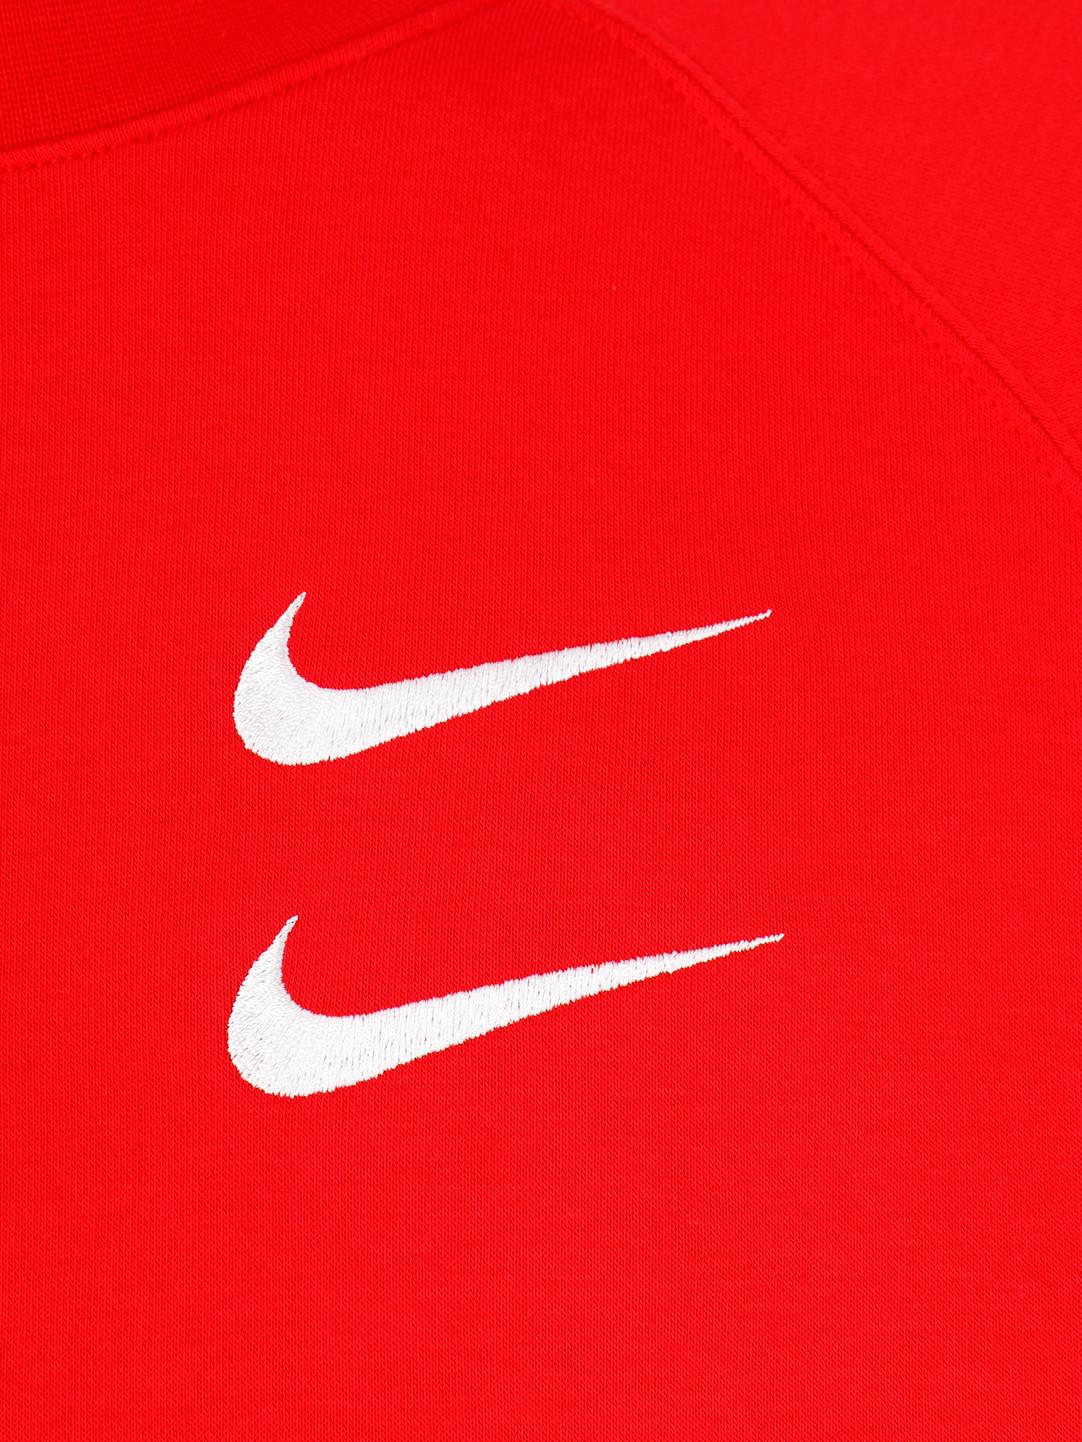 Nike Nike NSW Swoosh Crewneck Bb University Red White CJ4865-657